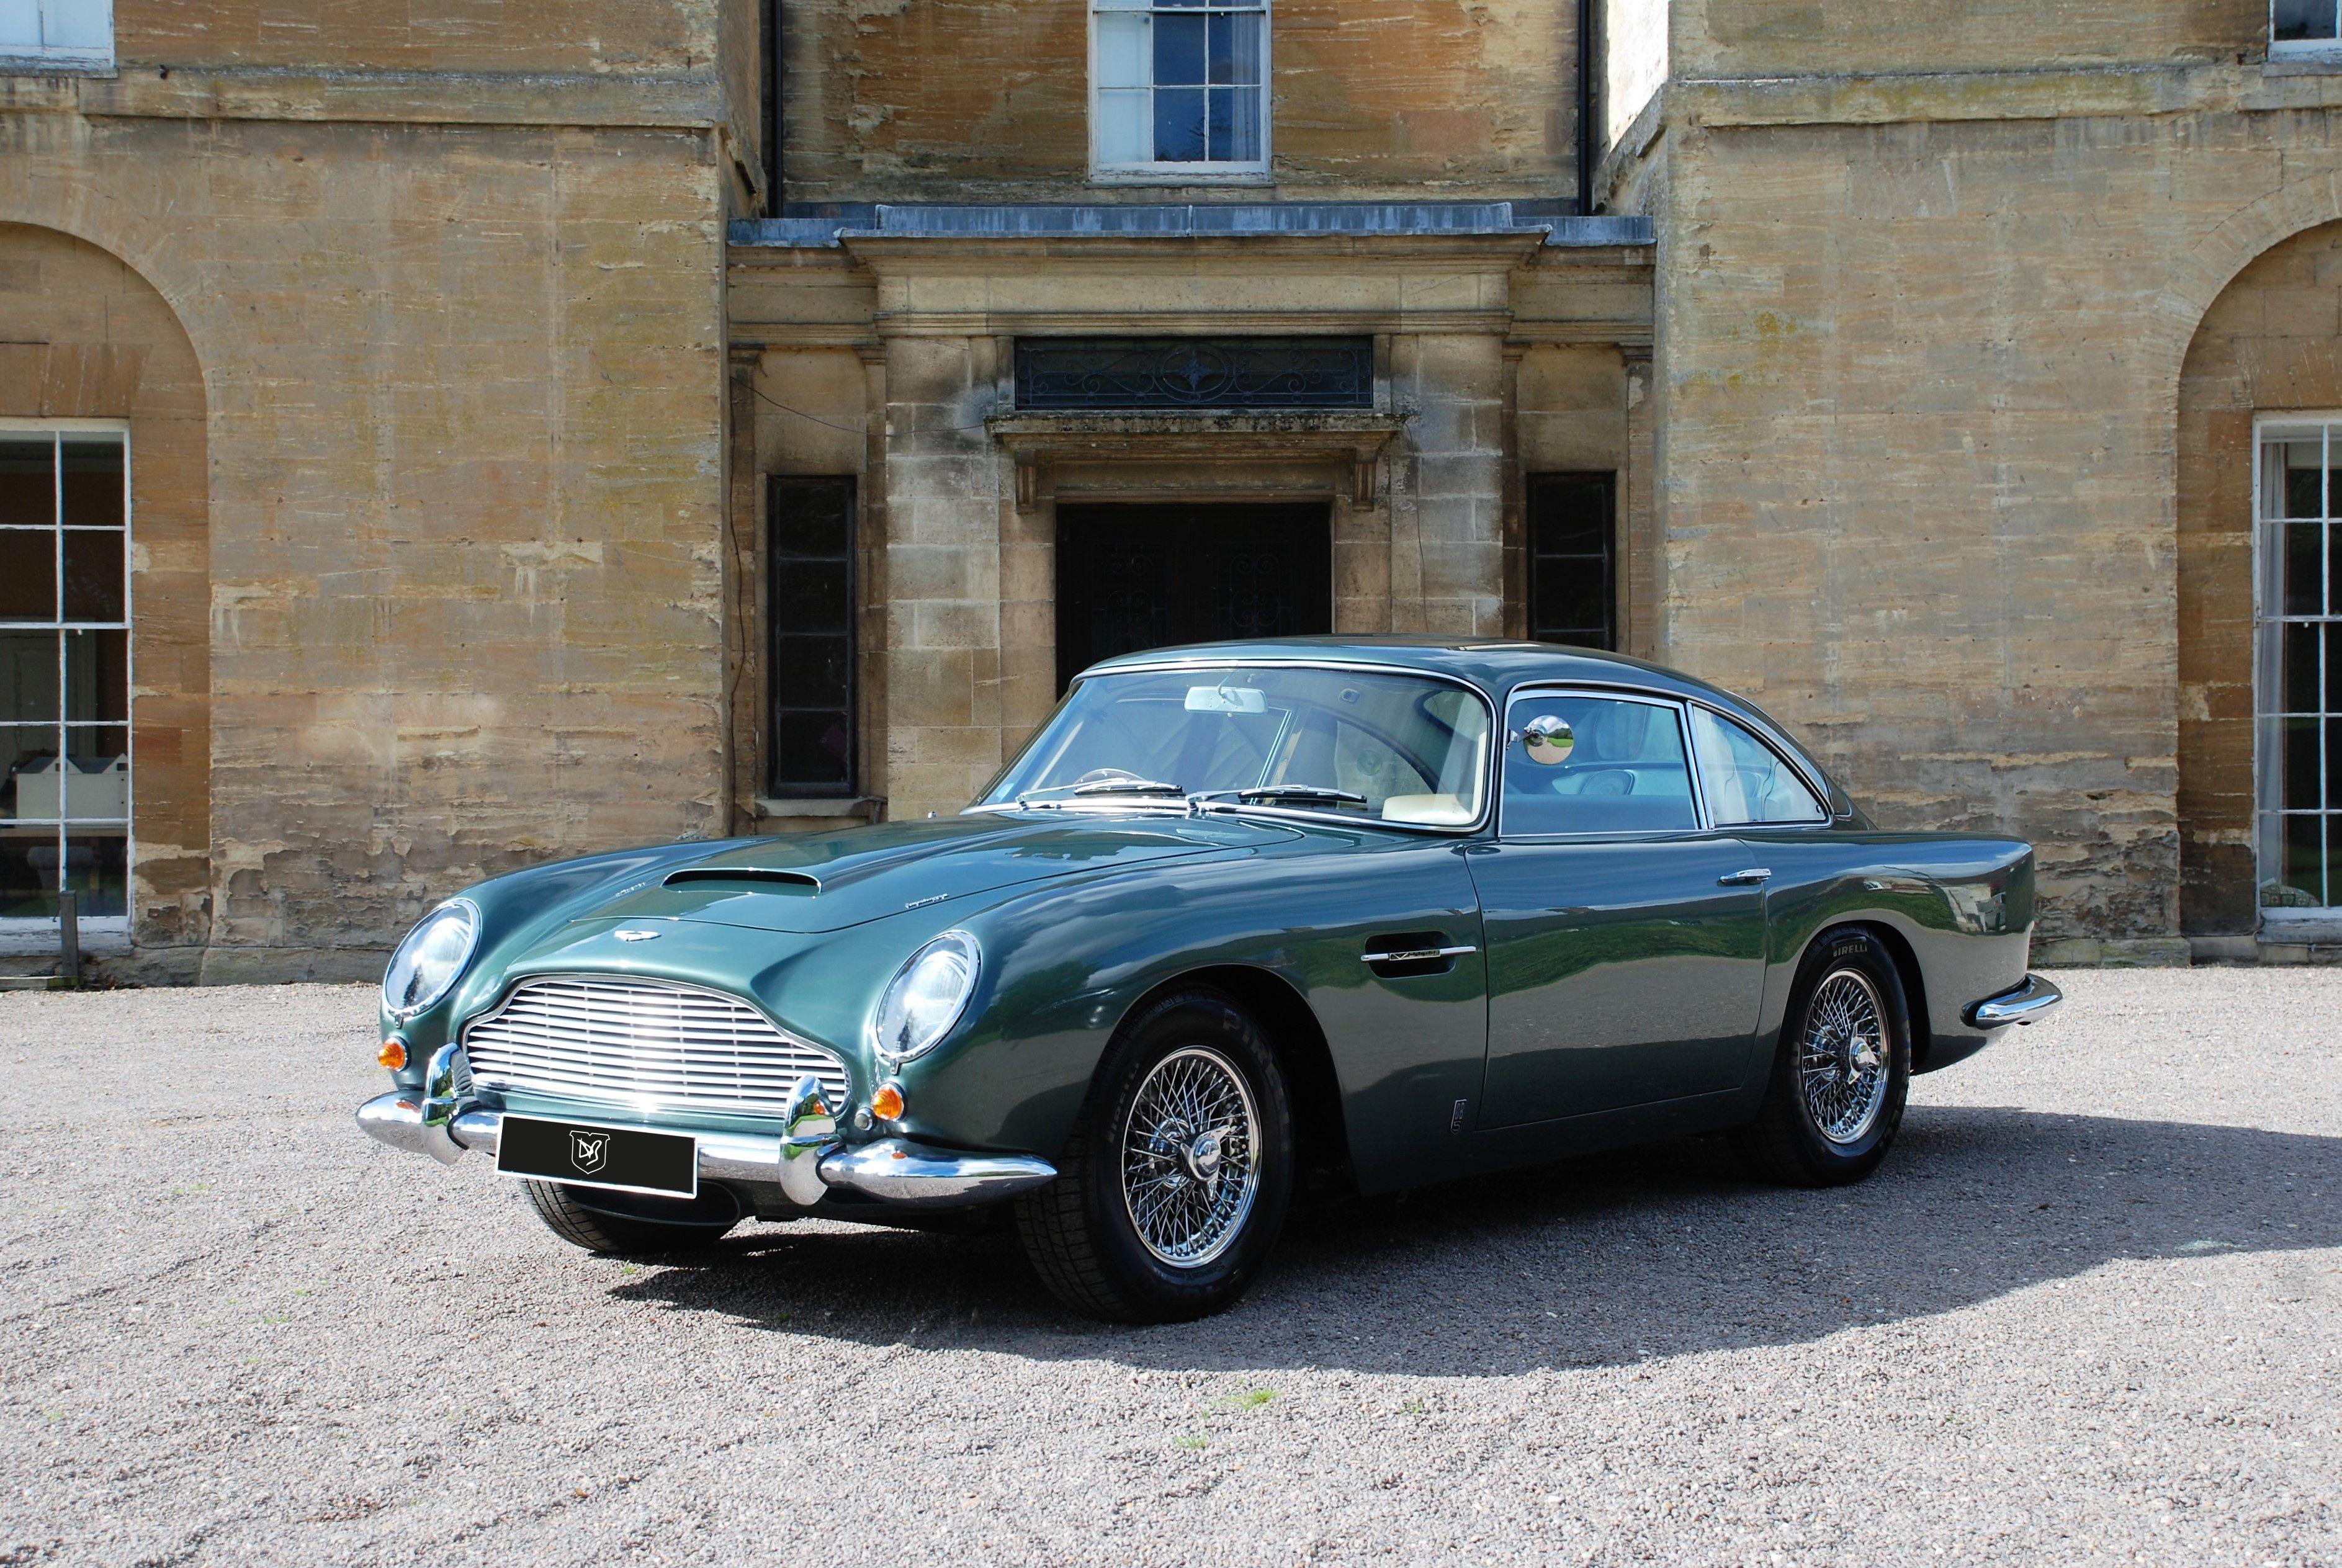 1964 Aston Martin Db5 Classic Driver Market Aston Martin For Sale Aston Martin Aston Martin Db5